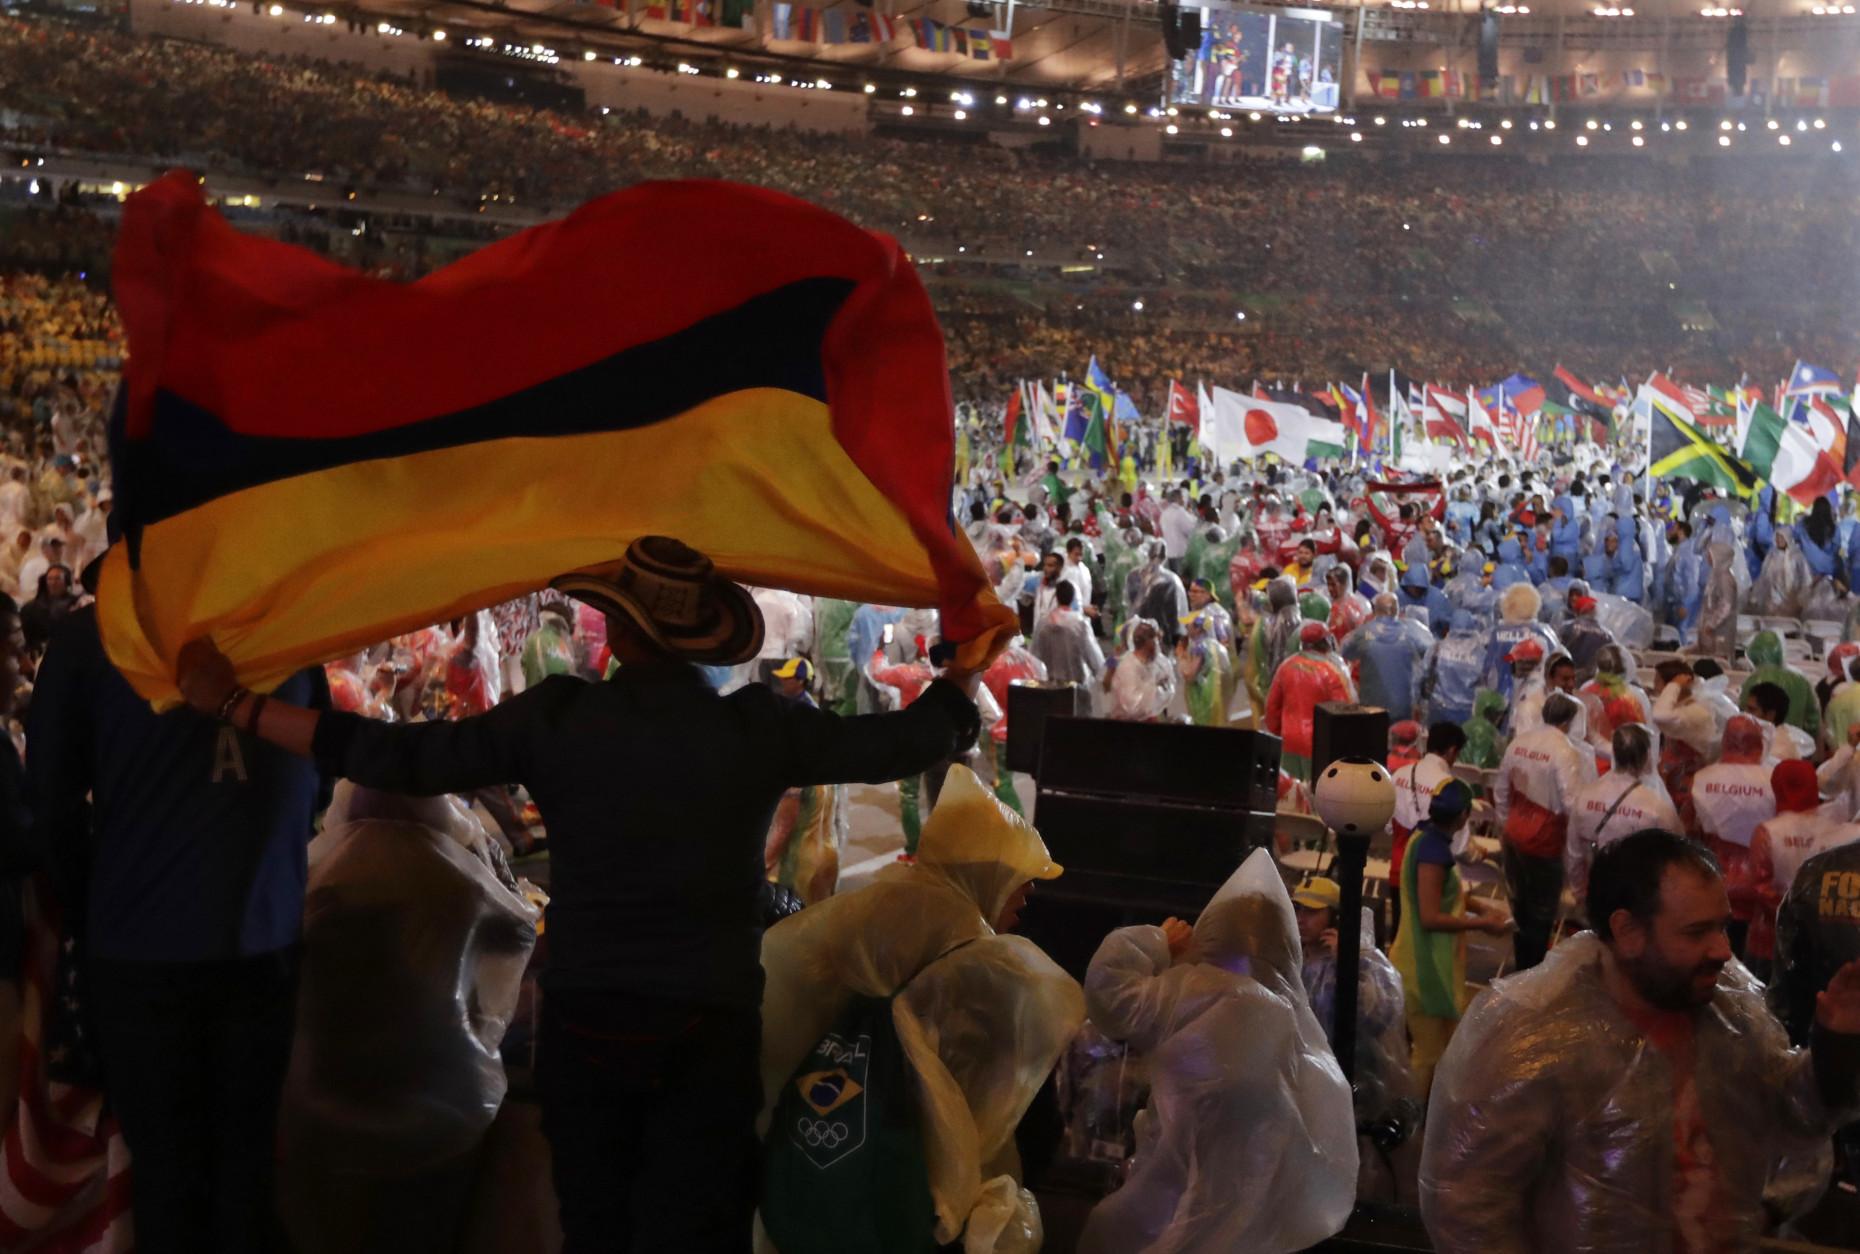 A man waves Colombia's flag during the closing ceremony for the Summer Olympics inside Maracana stadium in Rio de Janeiro, Brazil, Sunday, Aug. 21, 2016. (AP Photo/Jae C. Hong)